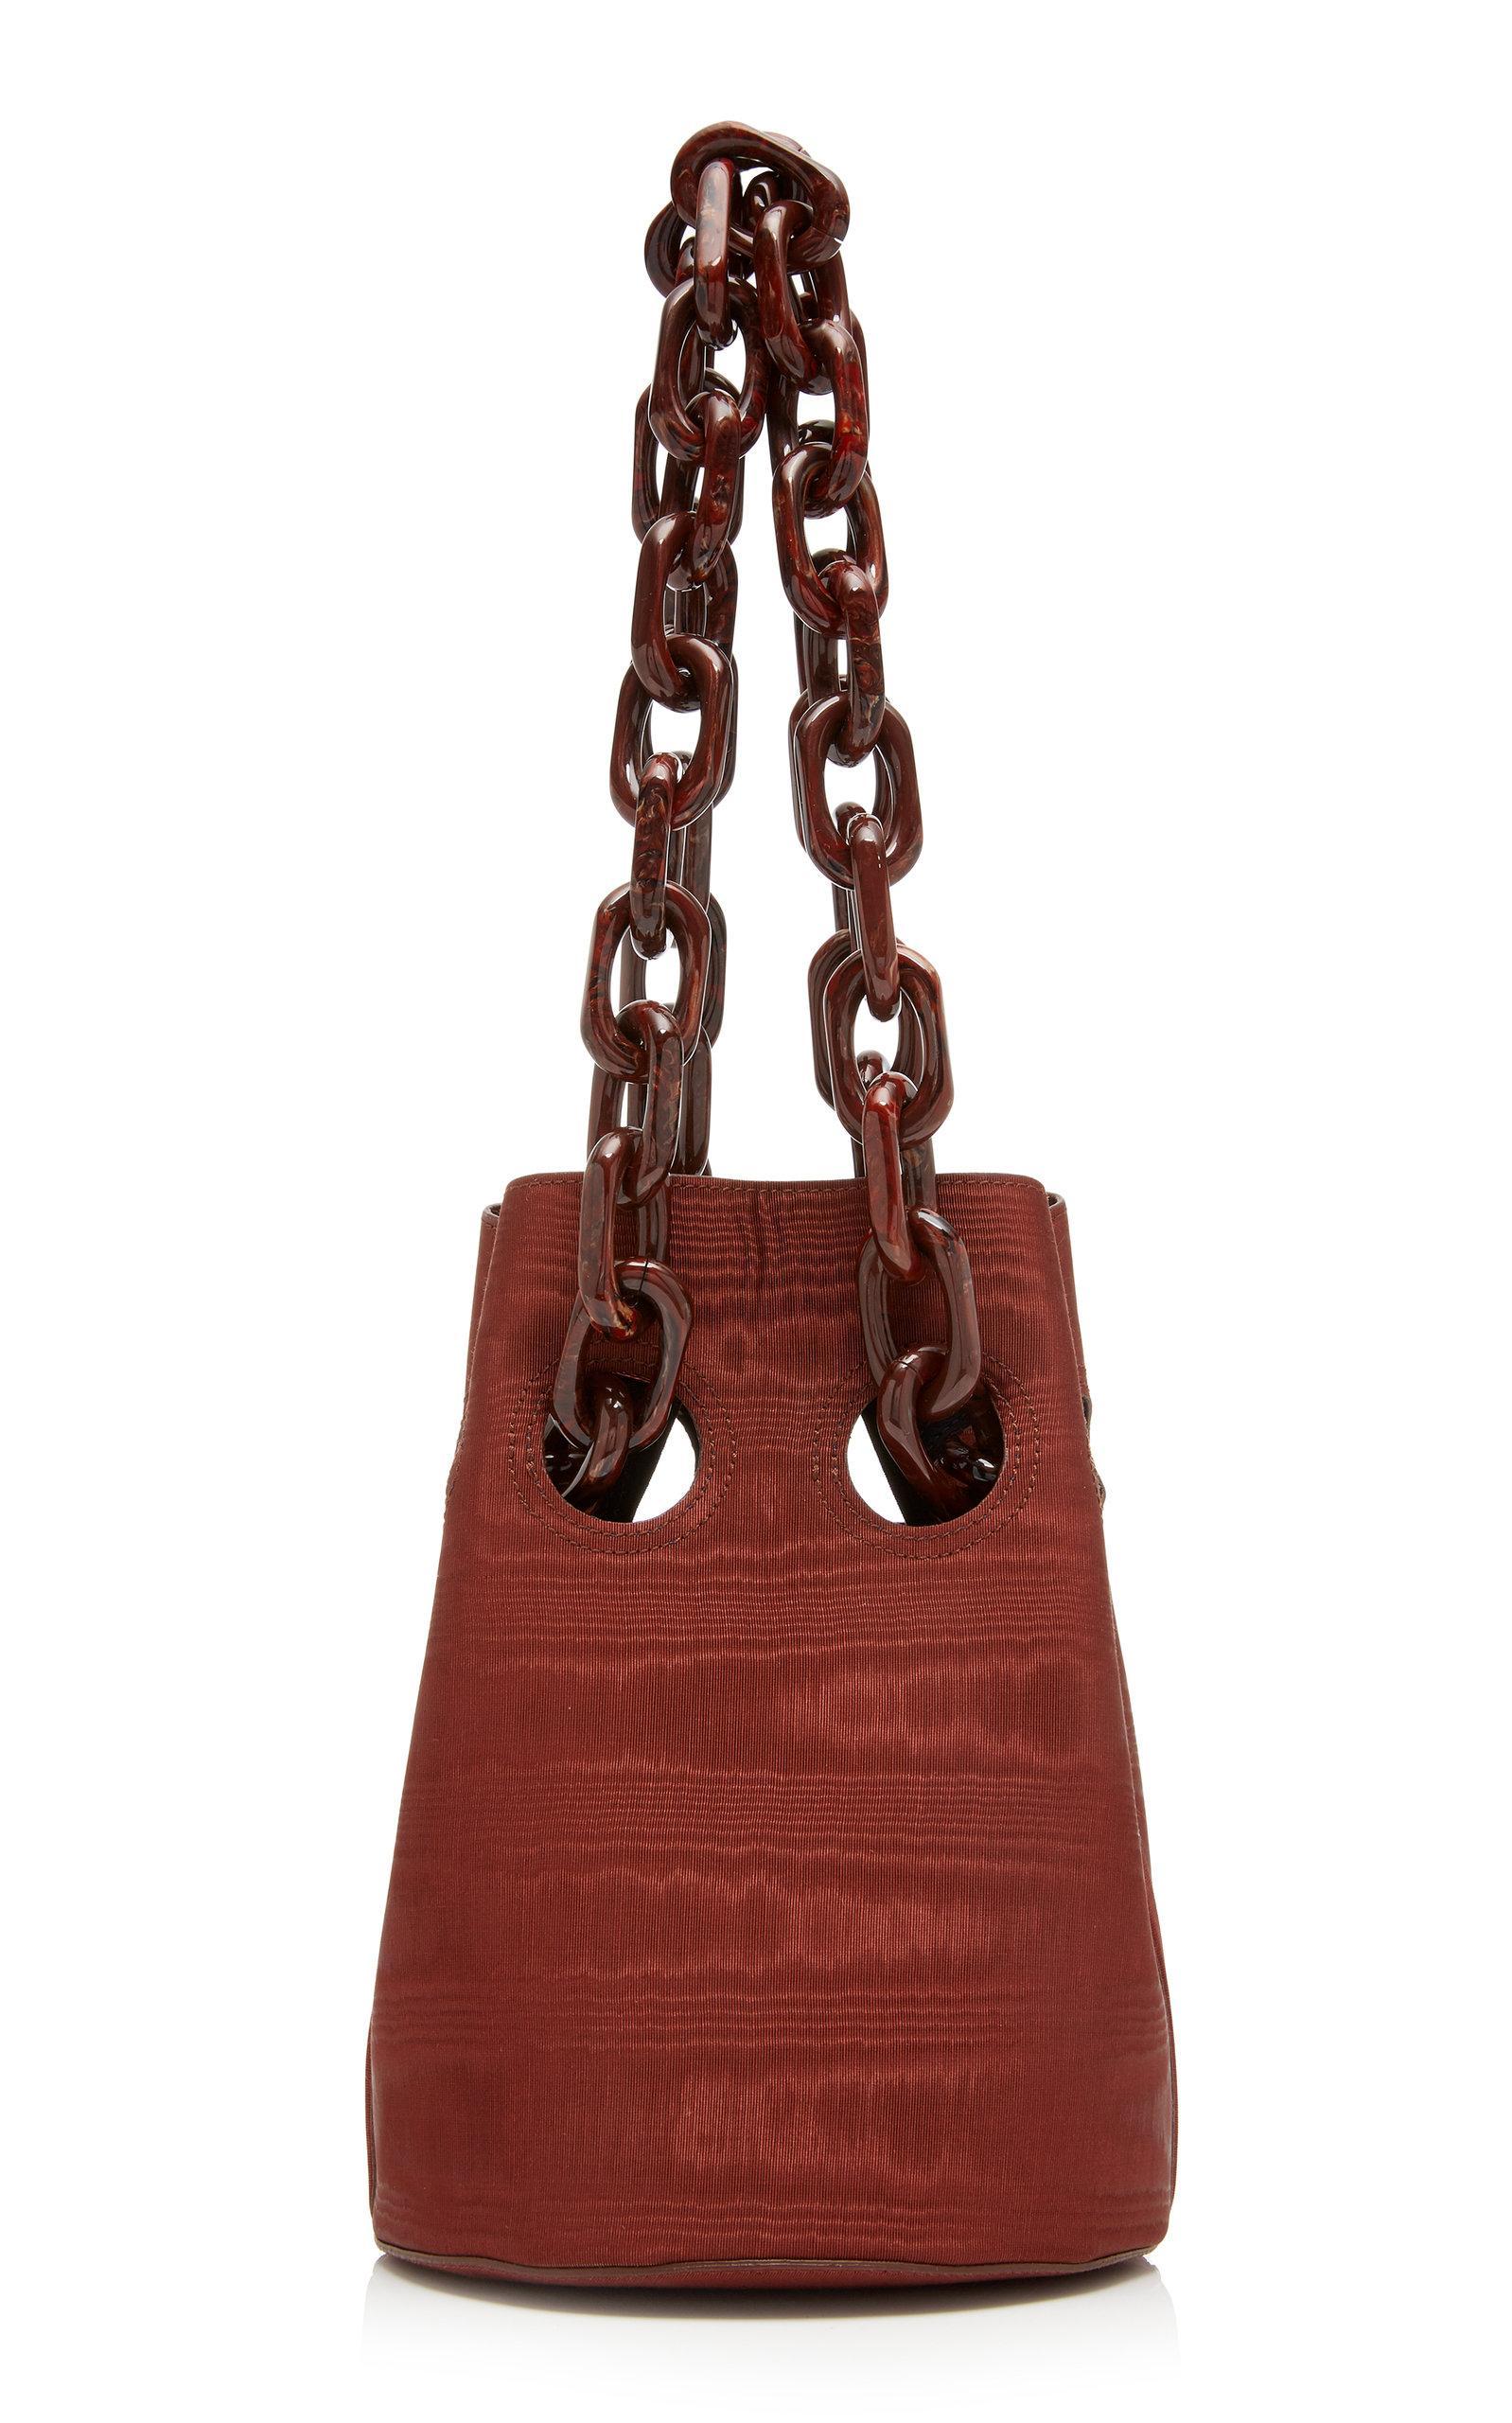 Trademark Goodall Bucket Bag With Resin Chain In Burgundy